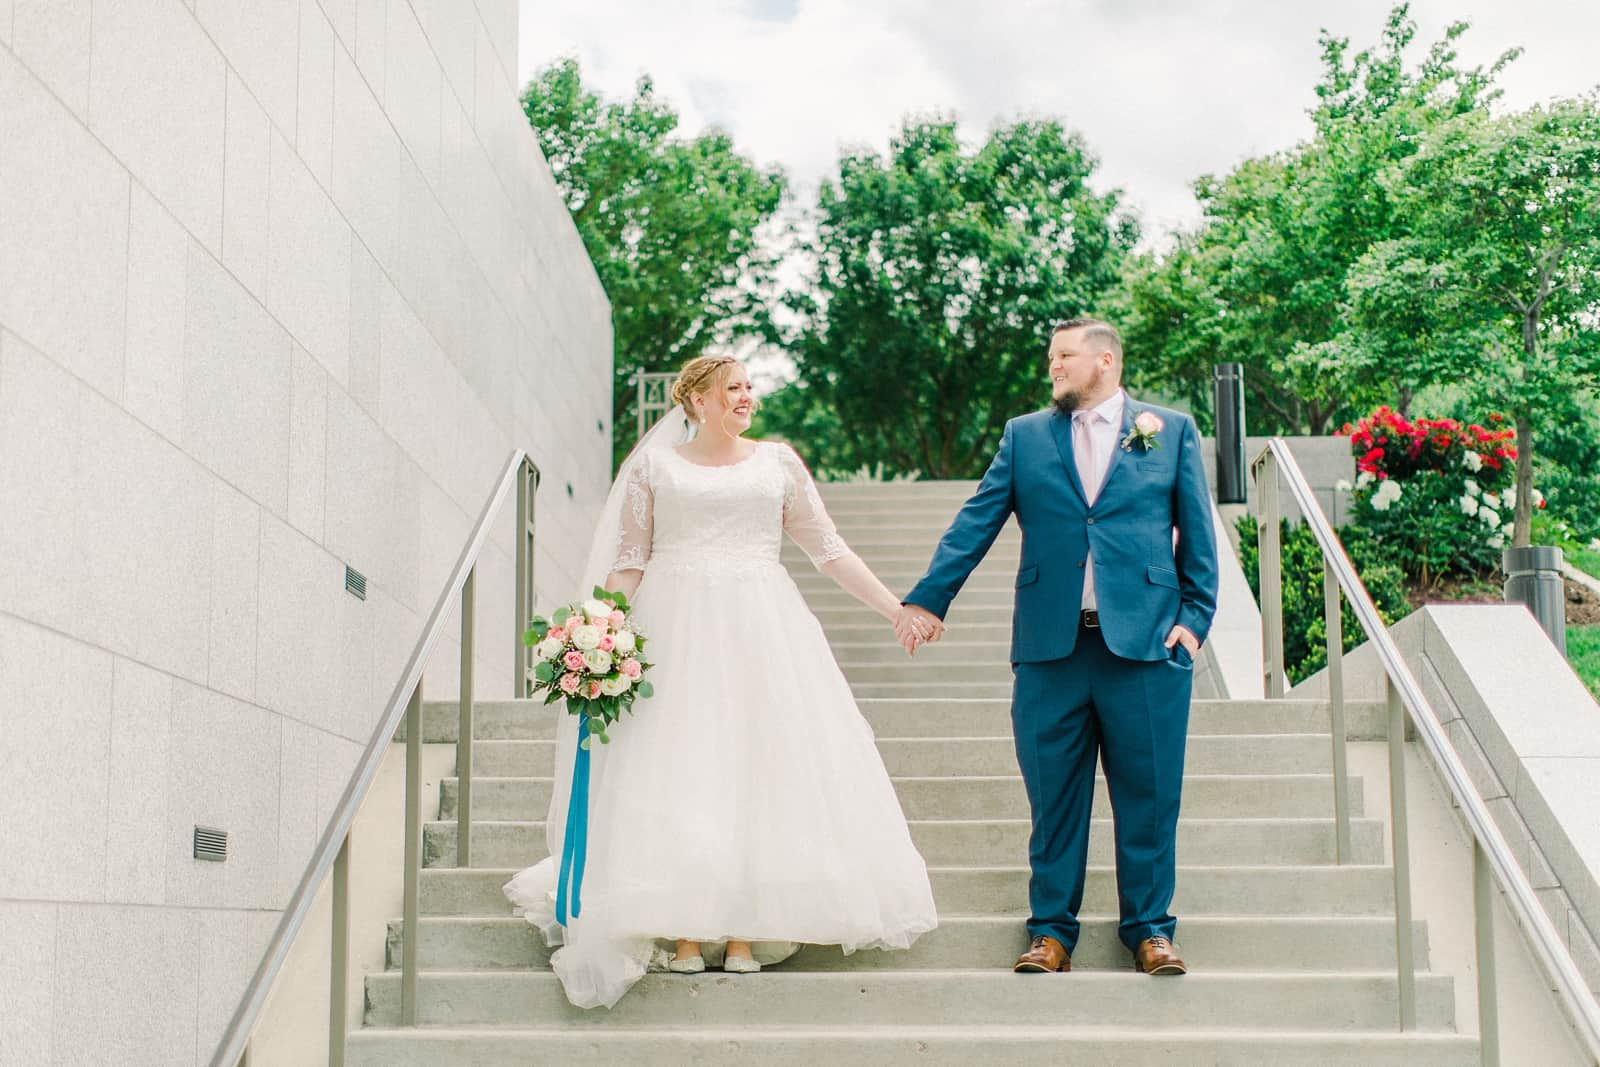 Draper LDS Temple Wedding, Utah wedding photography, summer backyard wedding, bride and groom